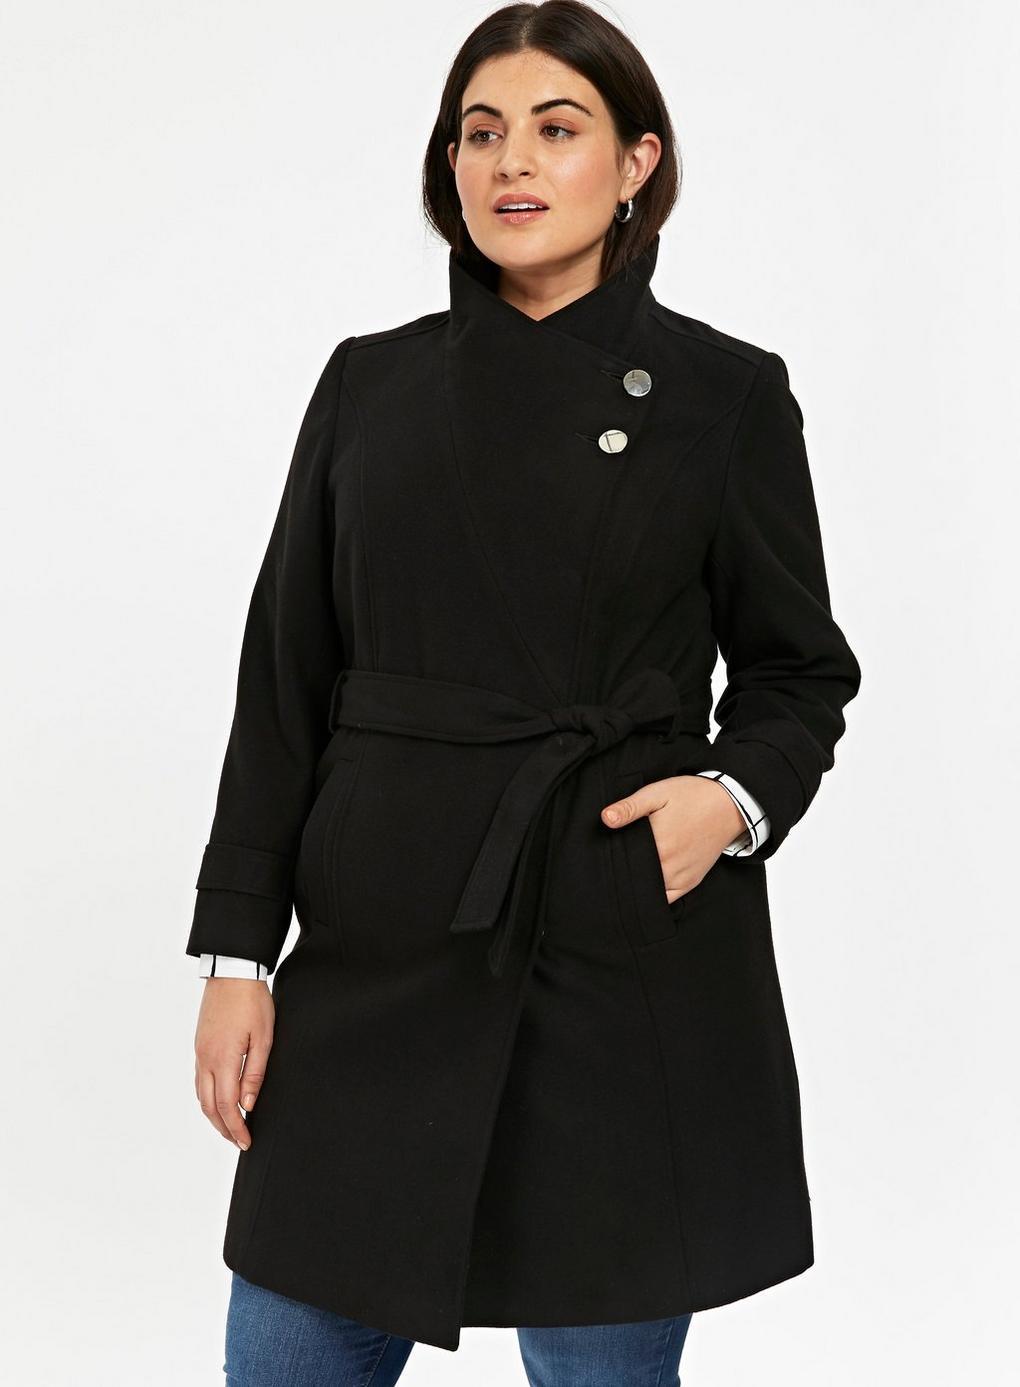 ebebf5630 Evans Black Tie Funnel Collar Coat in Black - Lyst